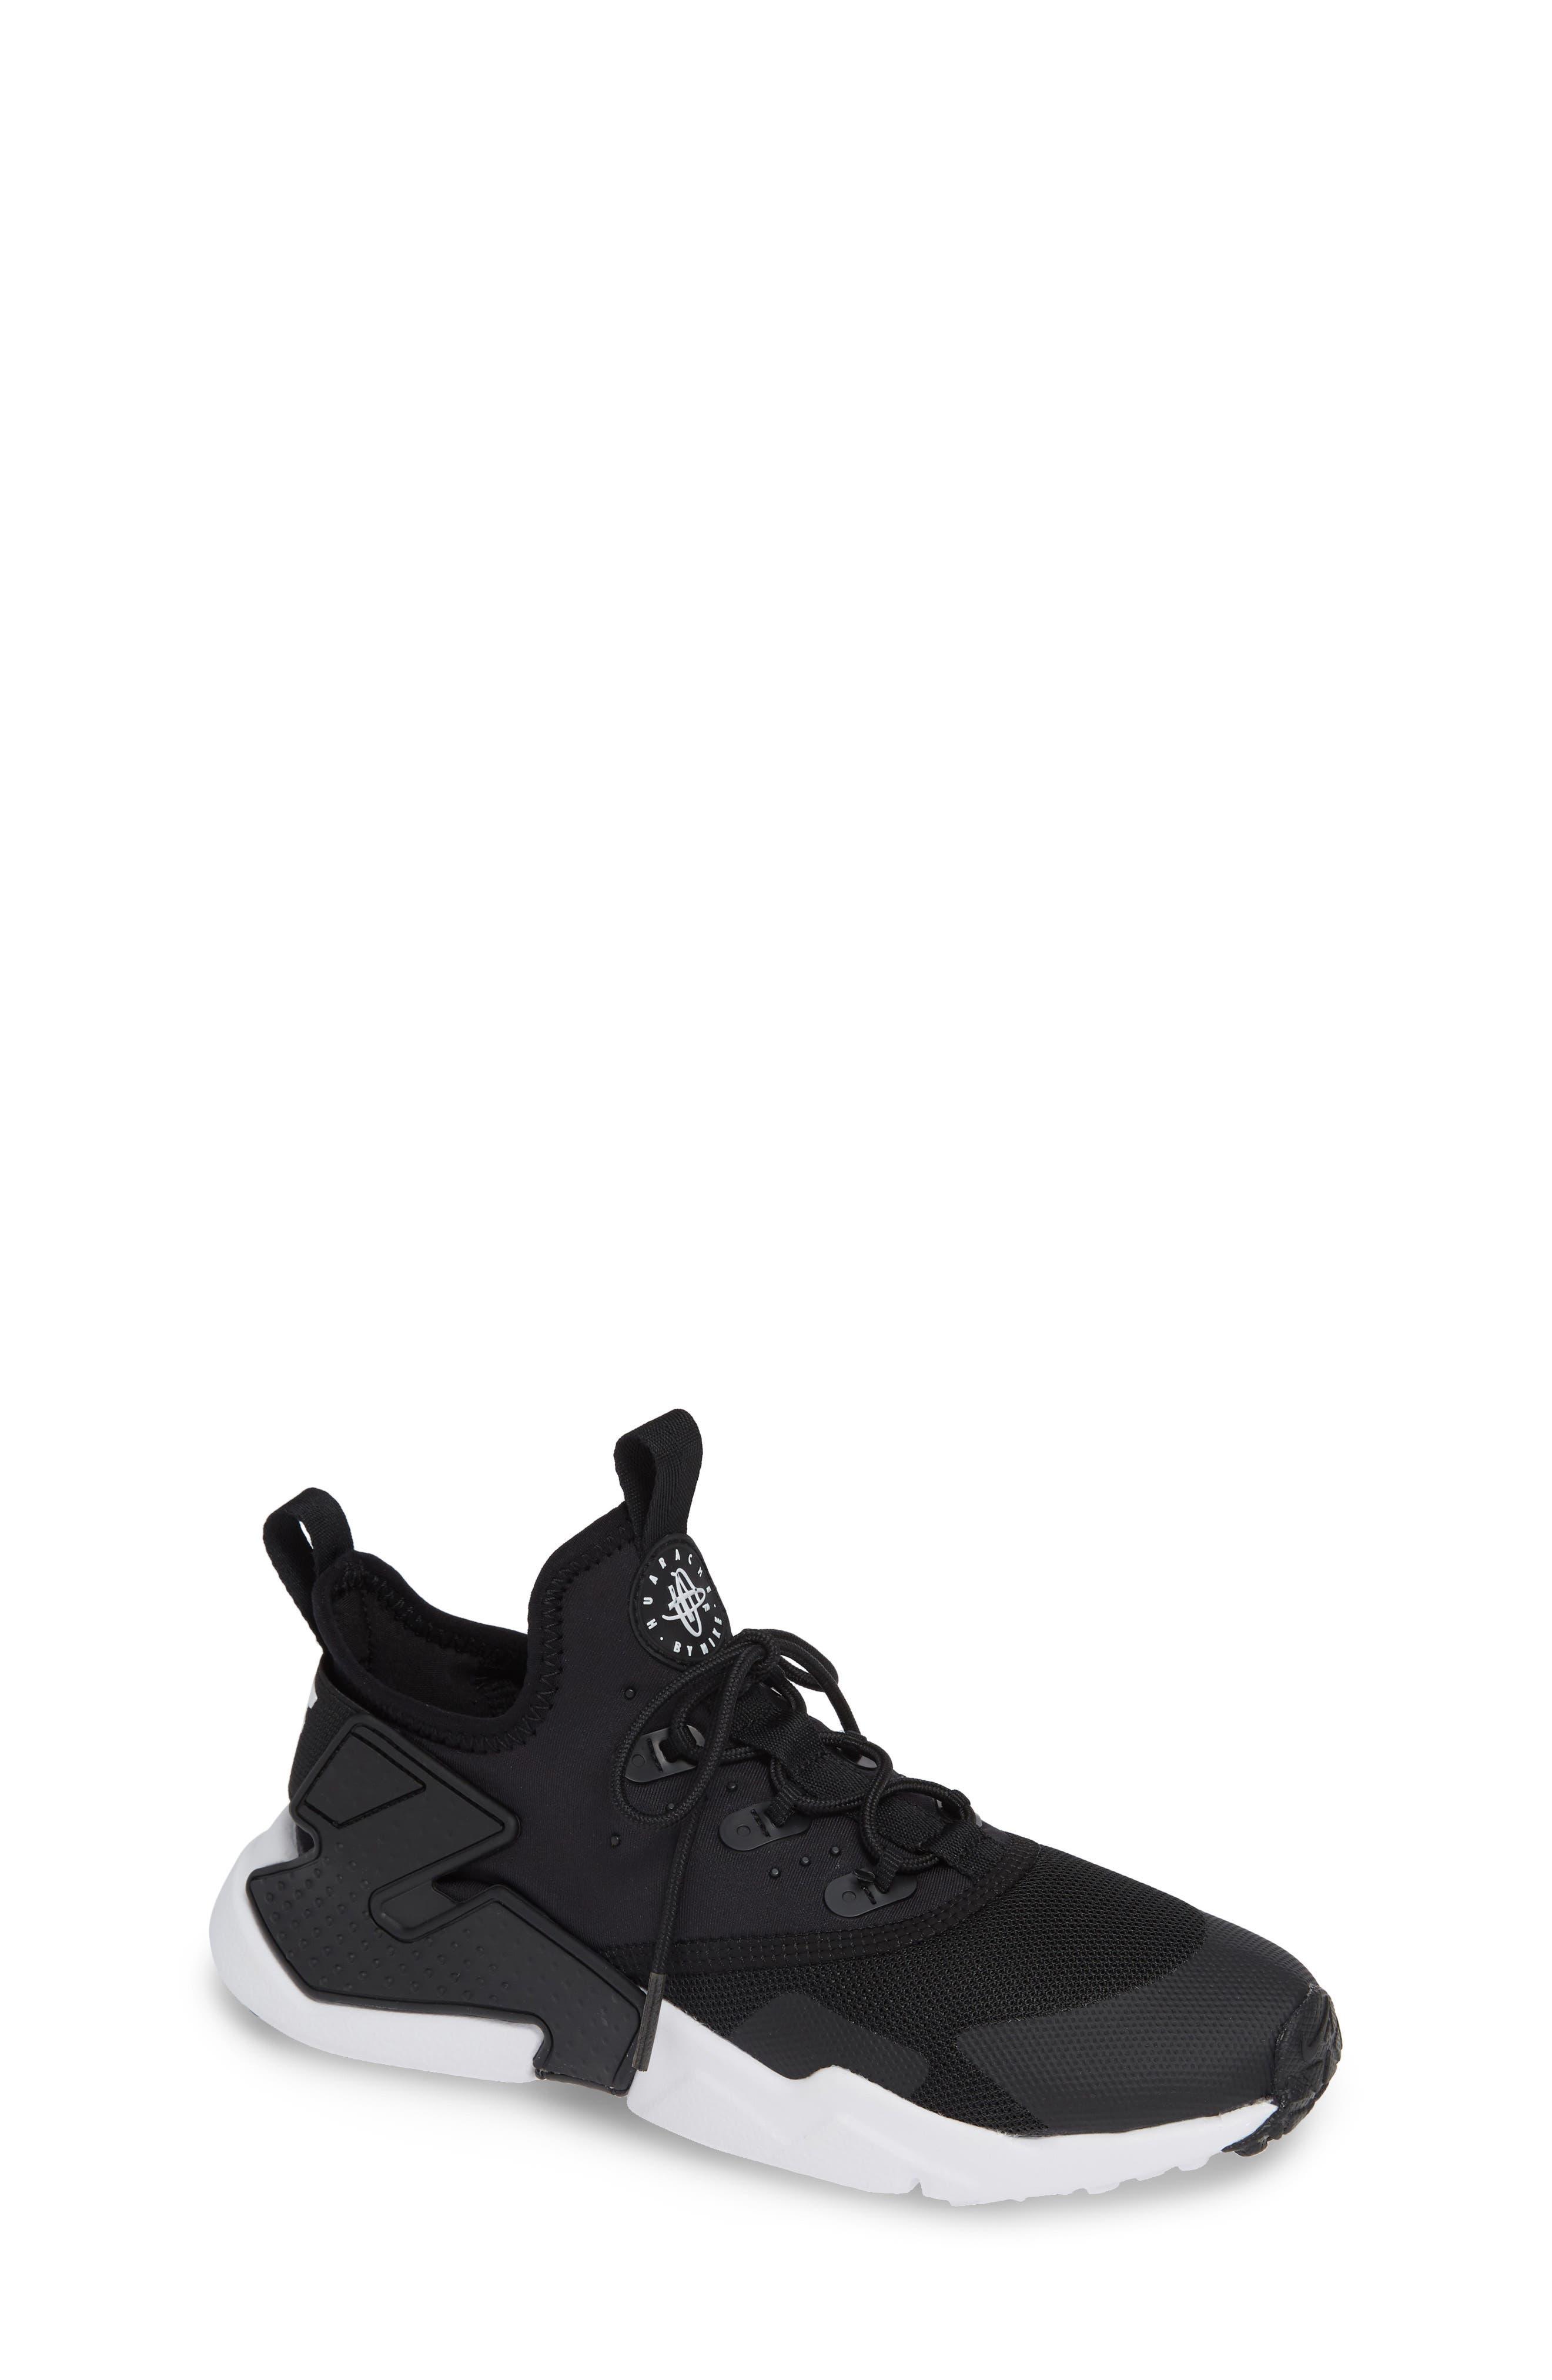 Huarache Run Drift Sneaker,                             Main thumbnail 1, color,                             Black/ Anthracite